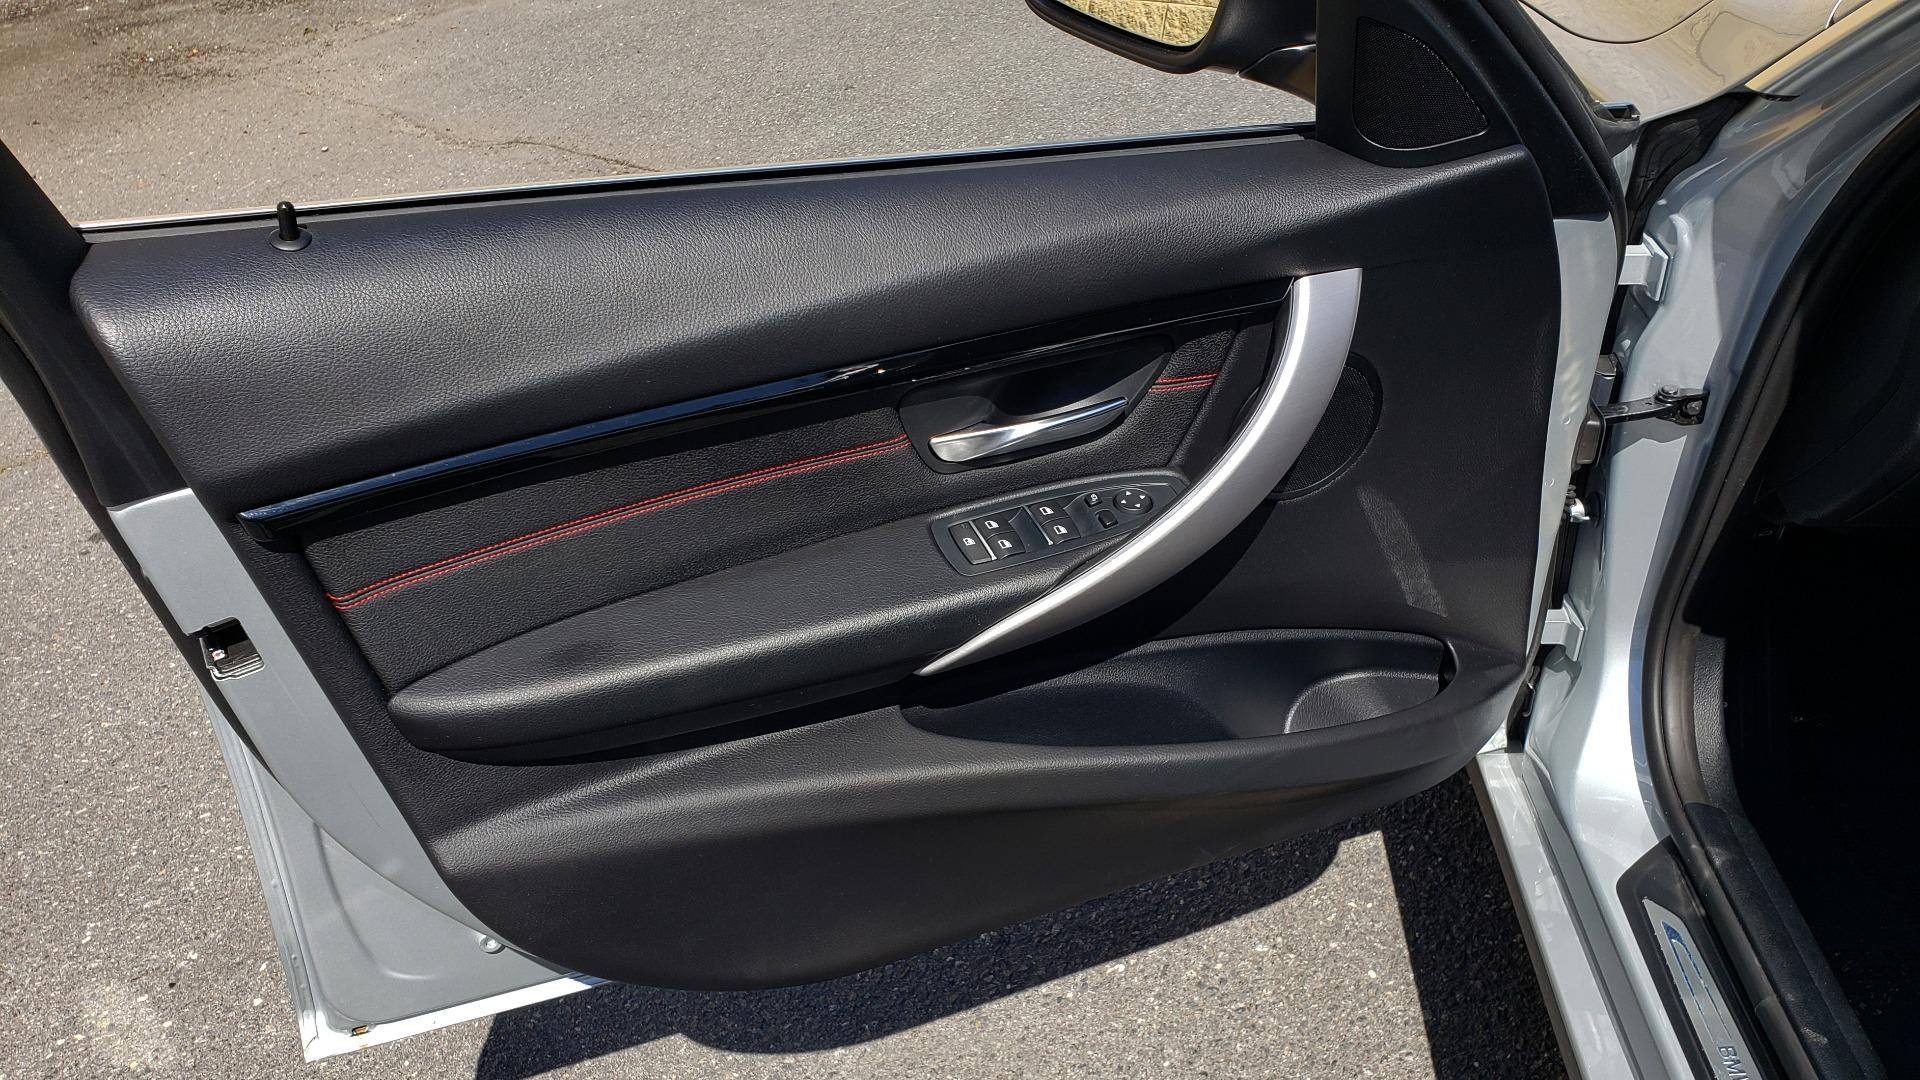 Used 2017 BMW 3 SERIES 330I SPORT SEDAN / DRVR ASST PKG / SUNROOF / REARVIEW for sale Sold at Formula Imports in Charlotte NC 28227 28